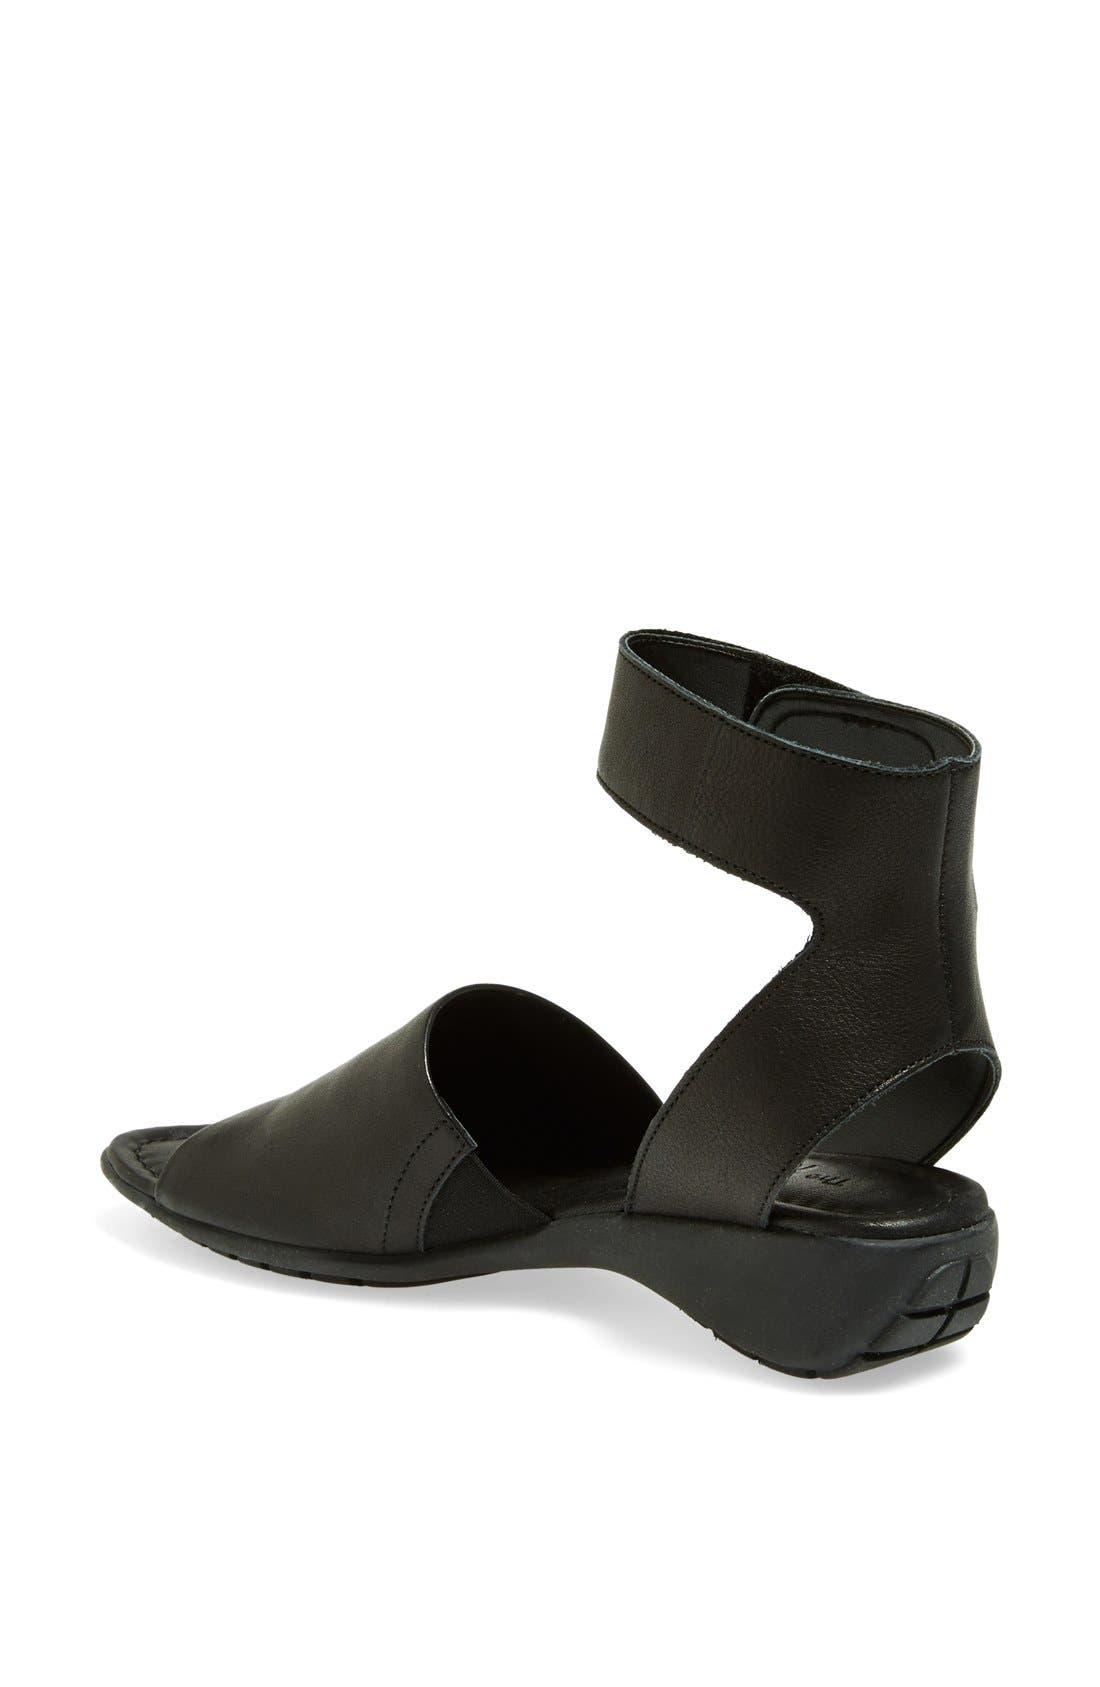 'Beglad' Leather Ankle Strap Sandal,                             Alternate thumbnail 21, color,